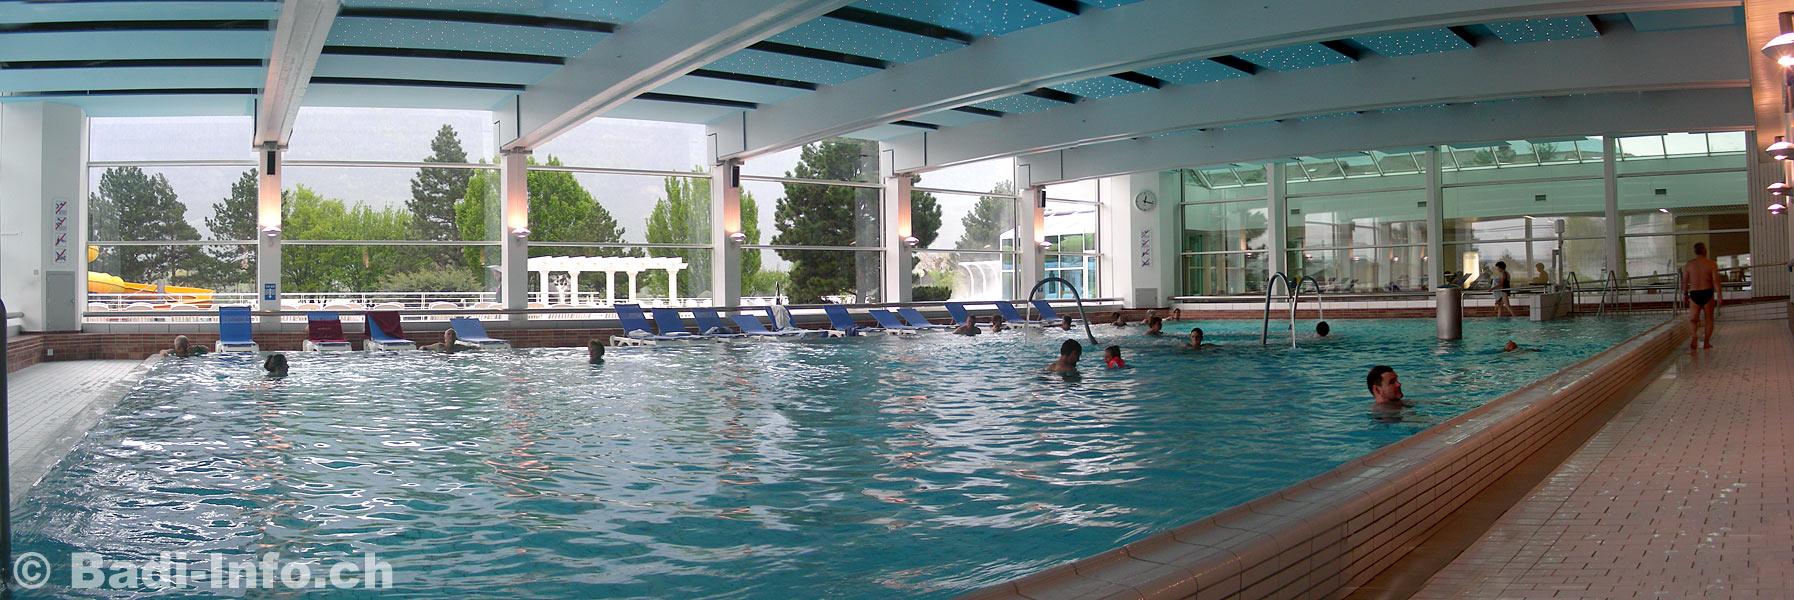 Saillon les bains thermaux for Hotel des bains saillon